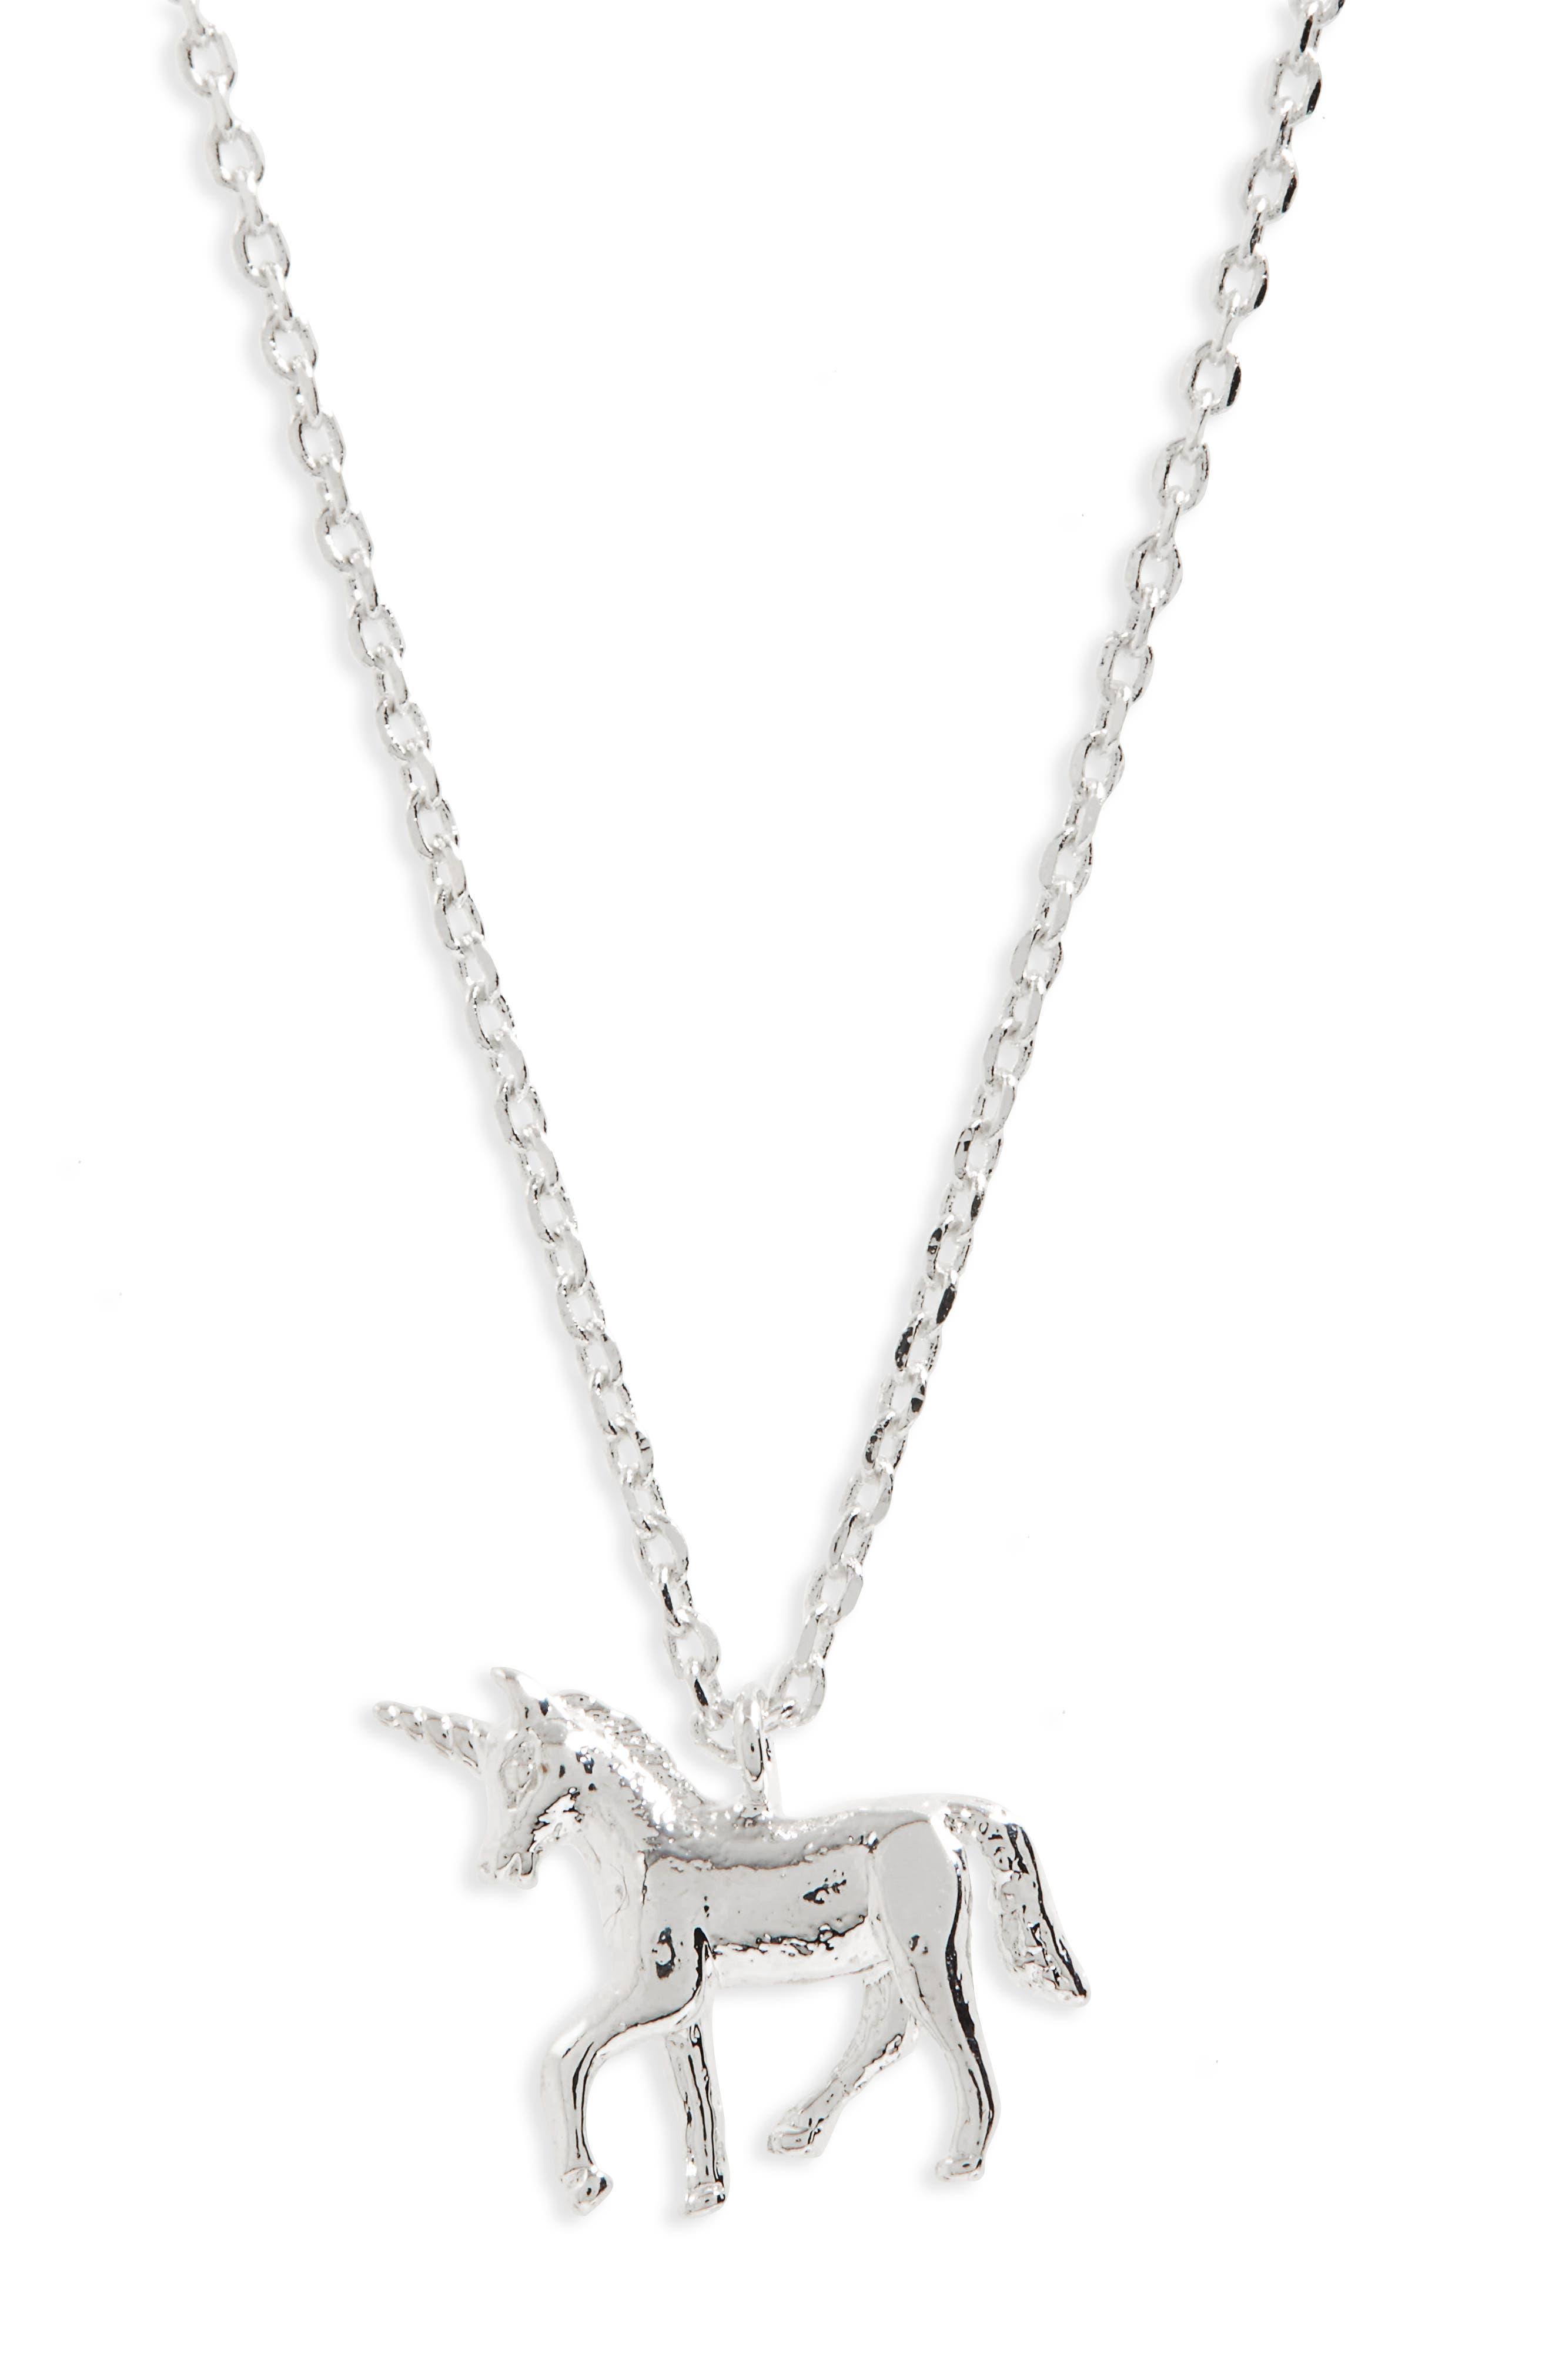 Treasure Me Unicorn Necklace,                             Main thumbnail 1, color,                             040